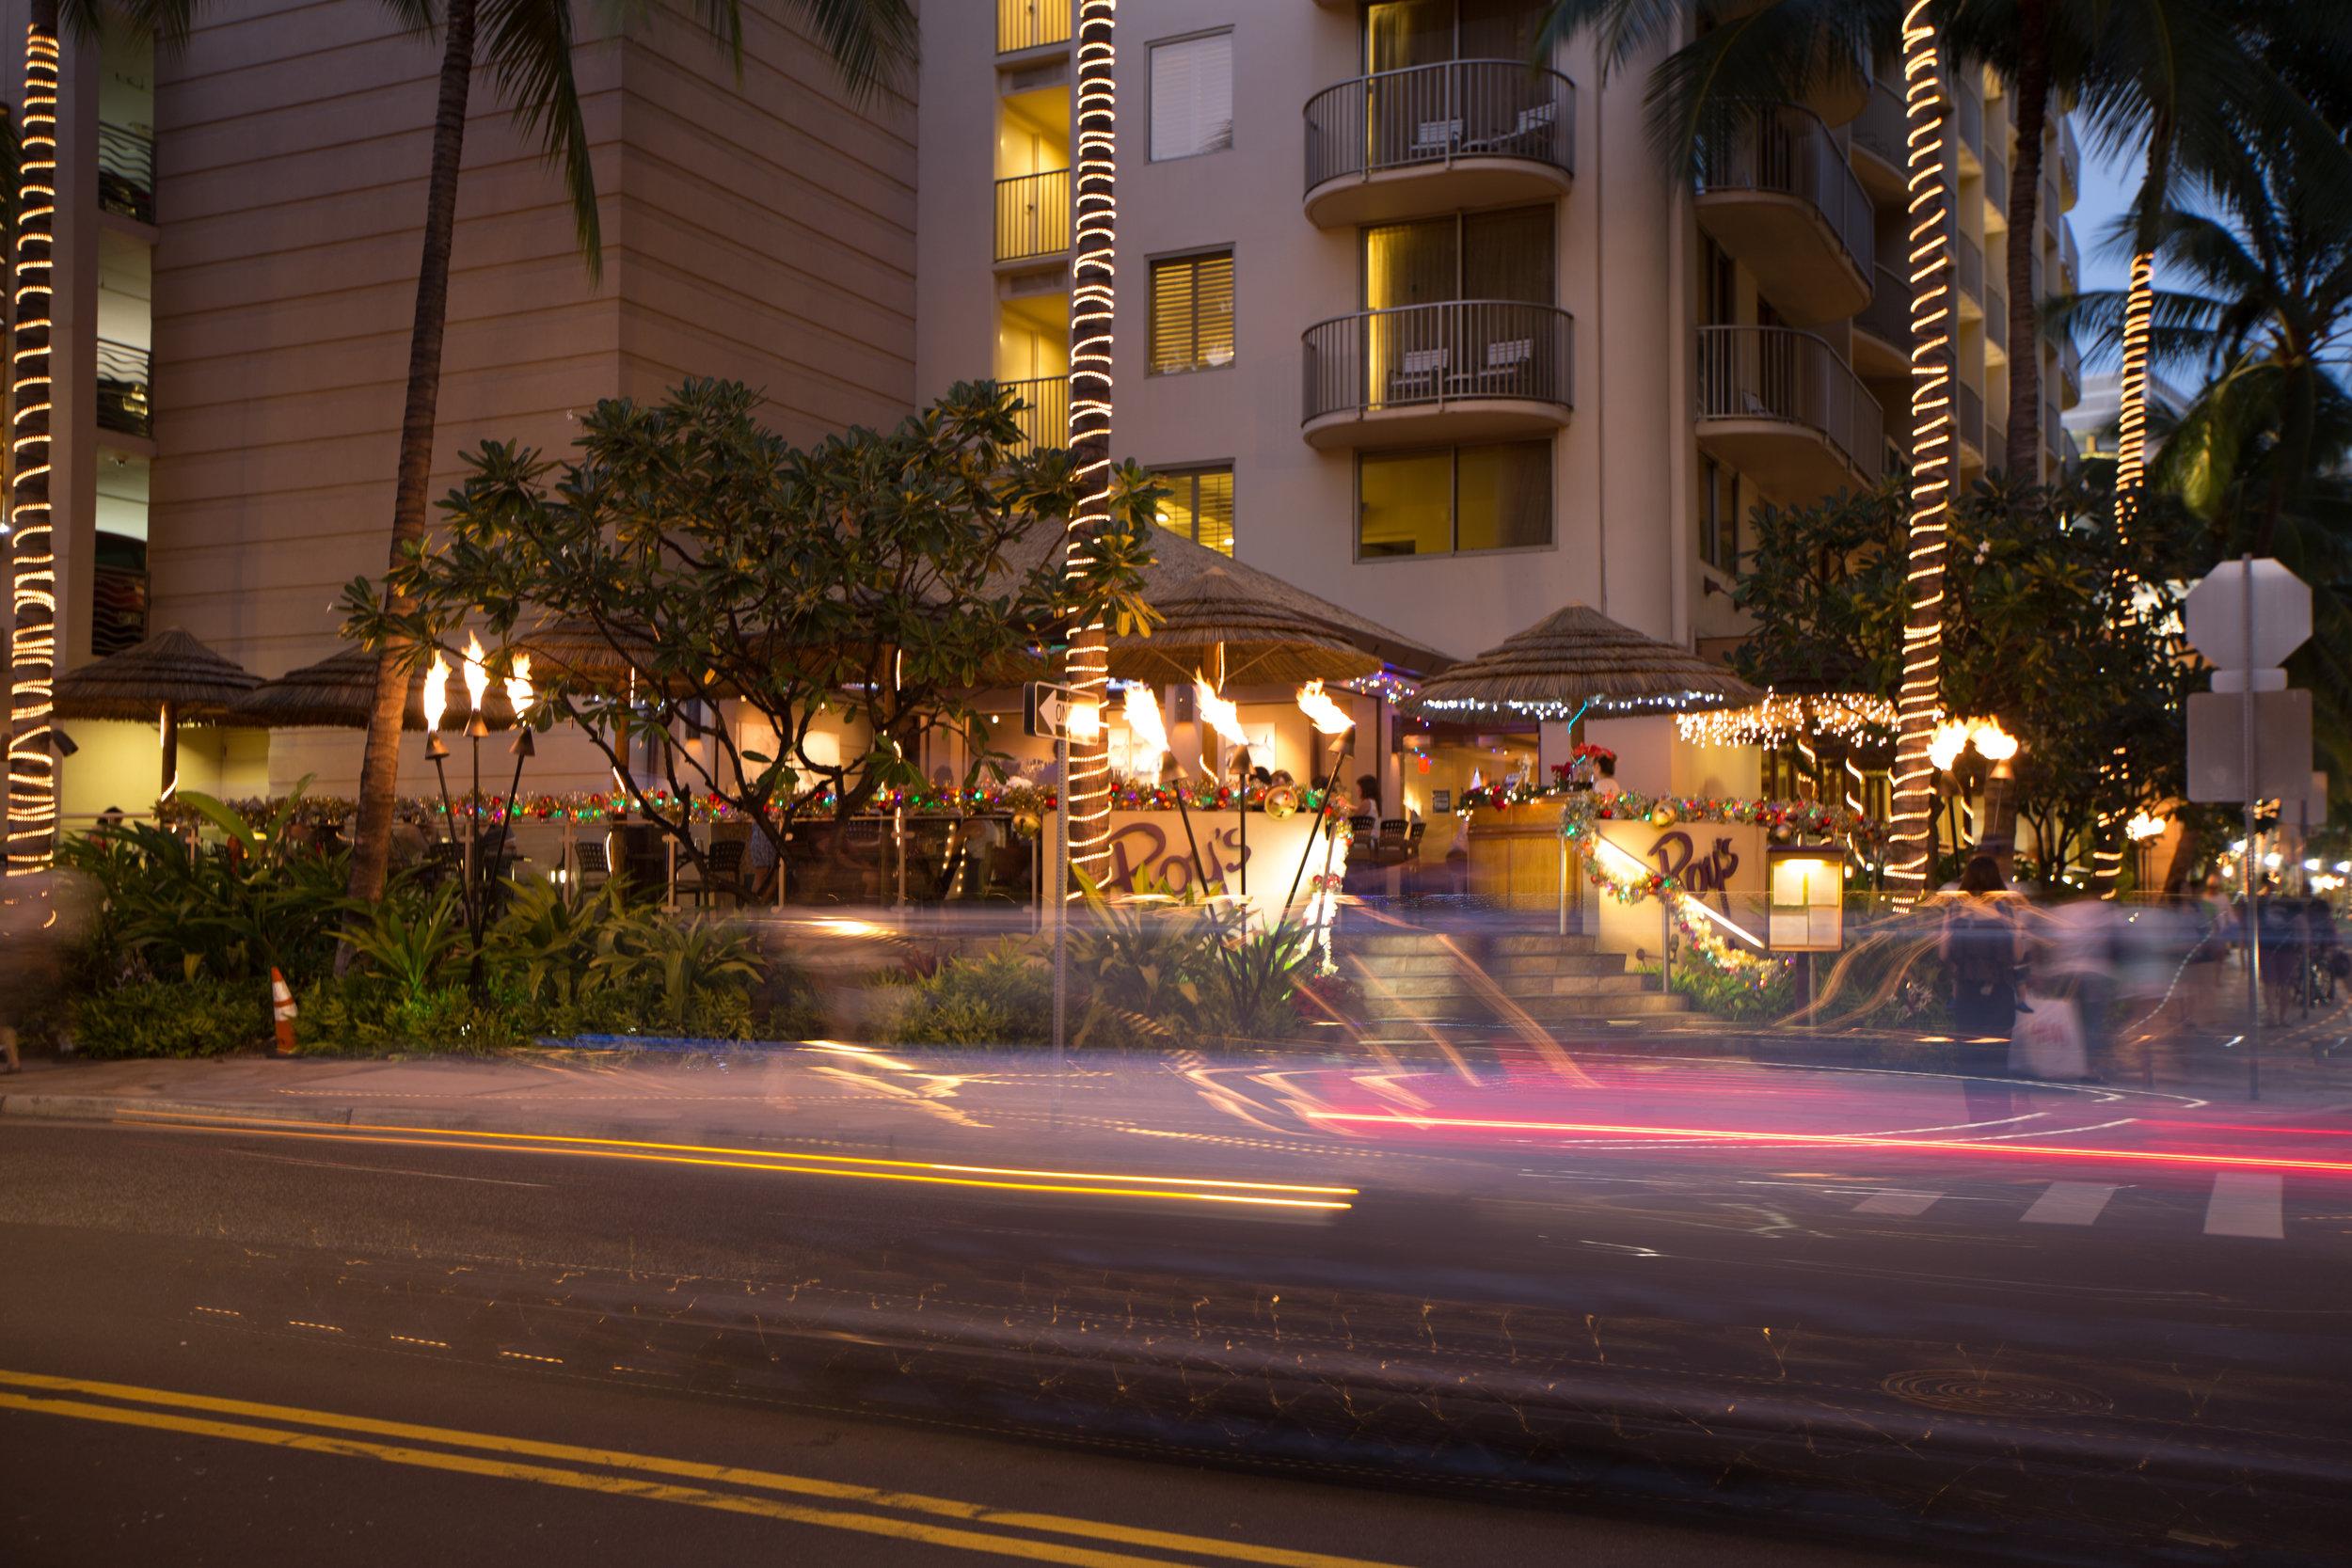 Dicas de Oahu - onde comer Honolulu - Roys Waikiki